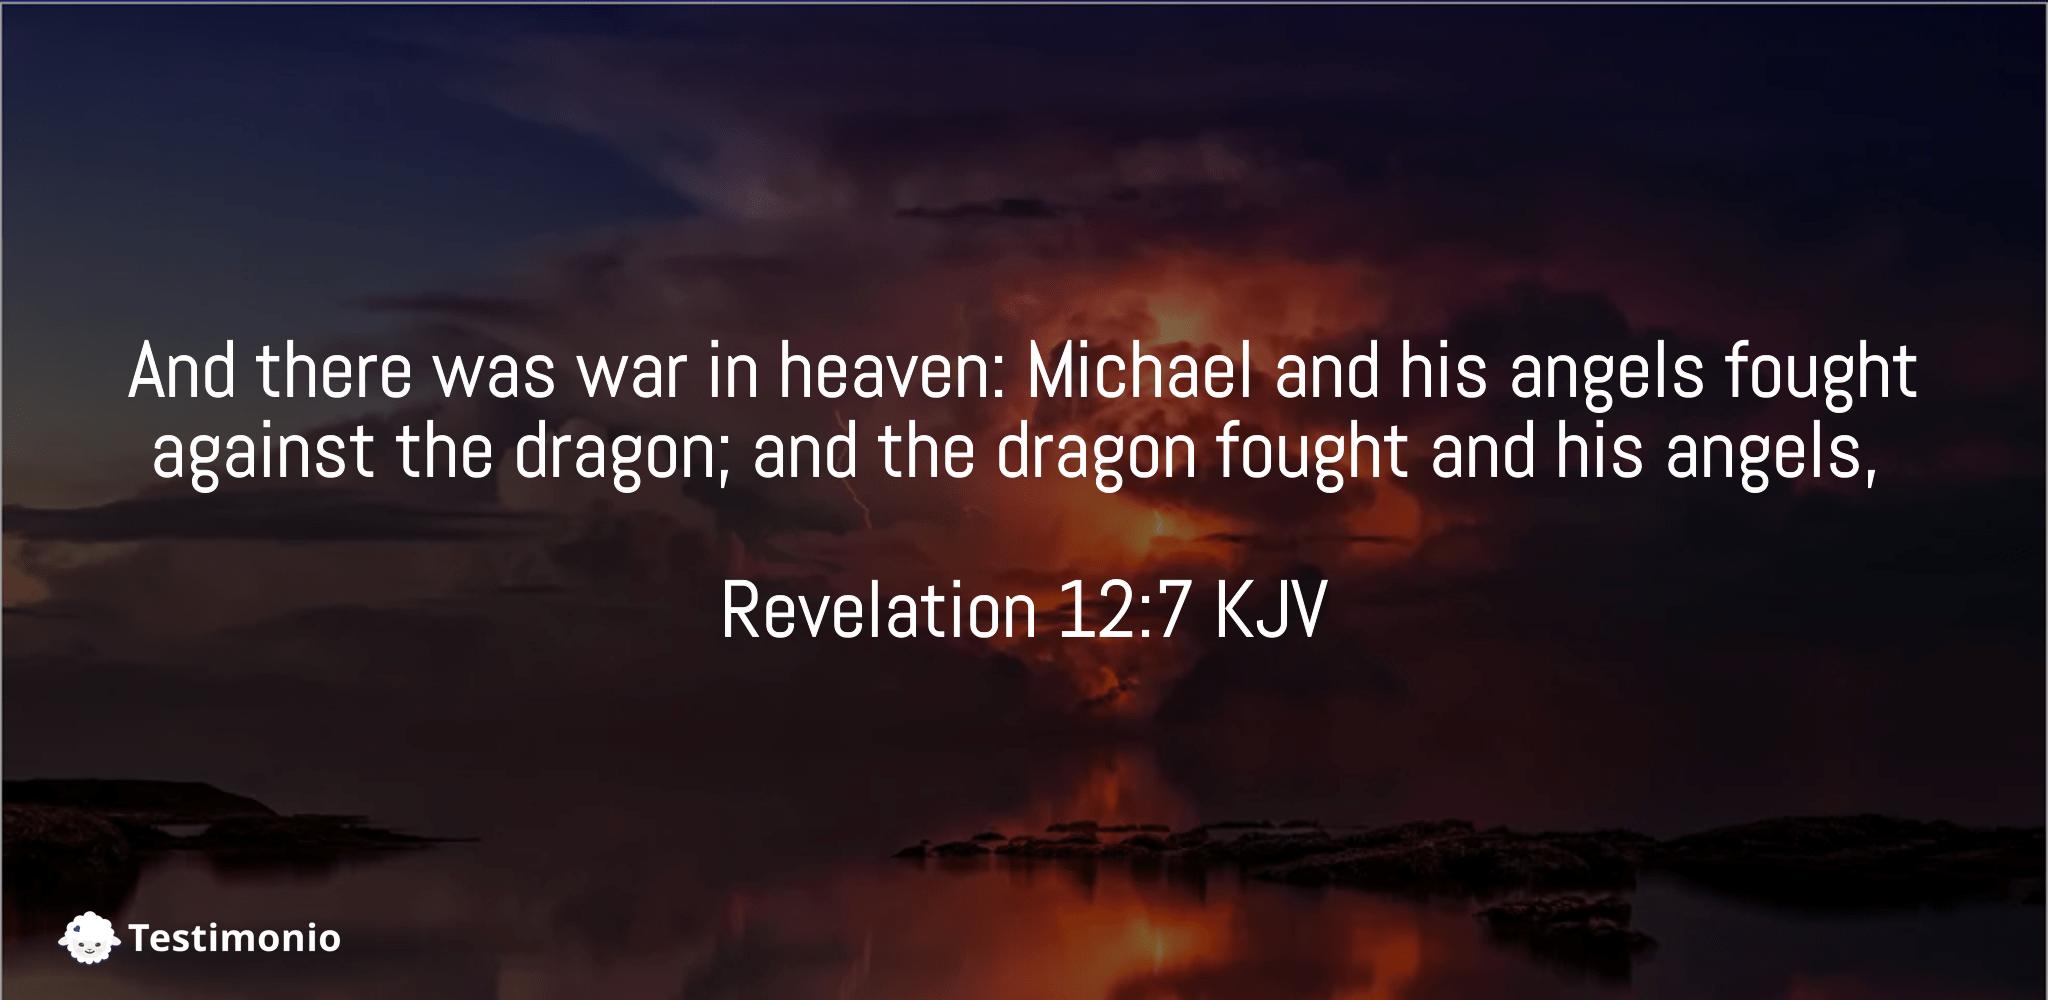 Revelation 12:7